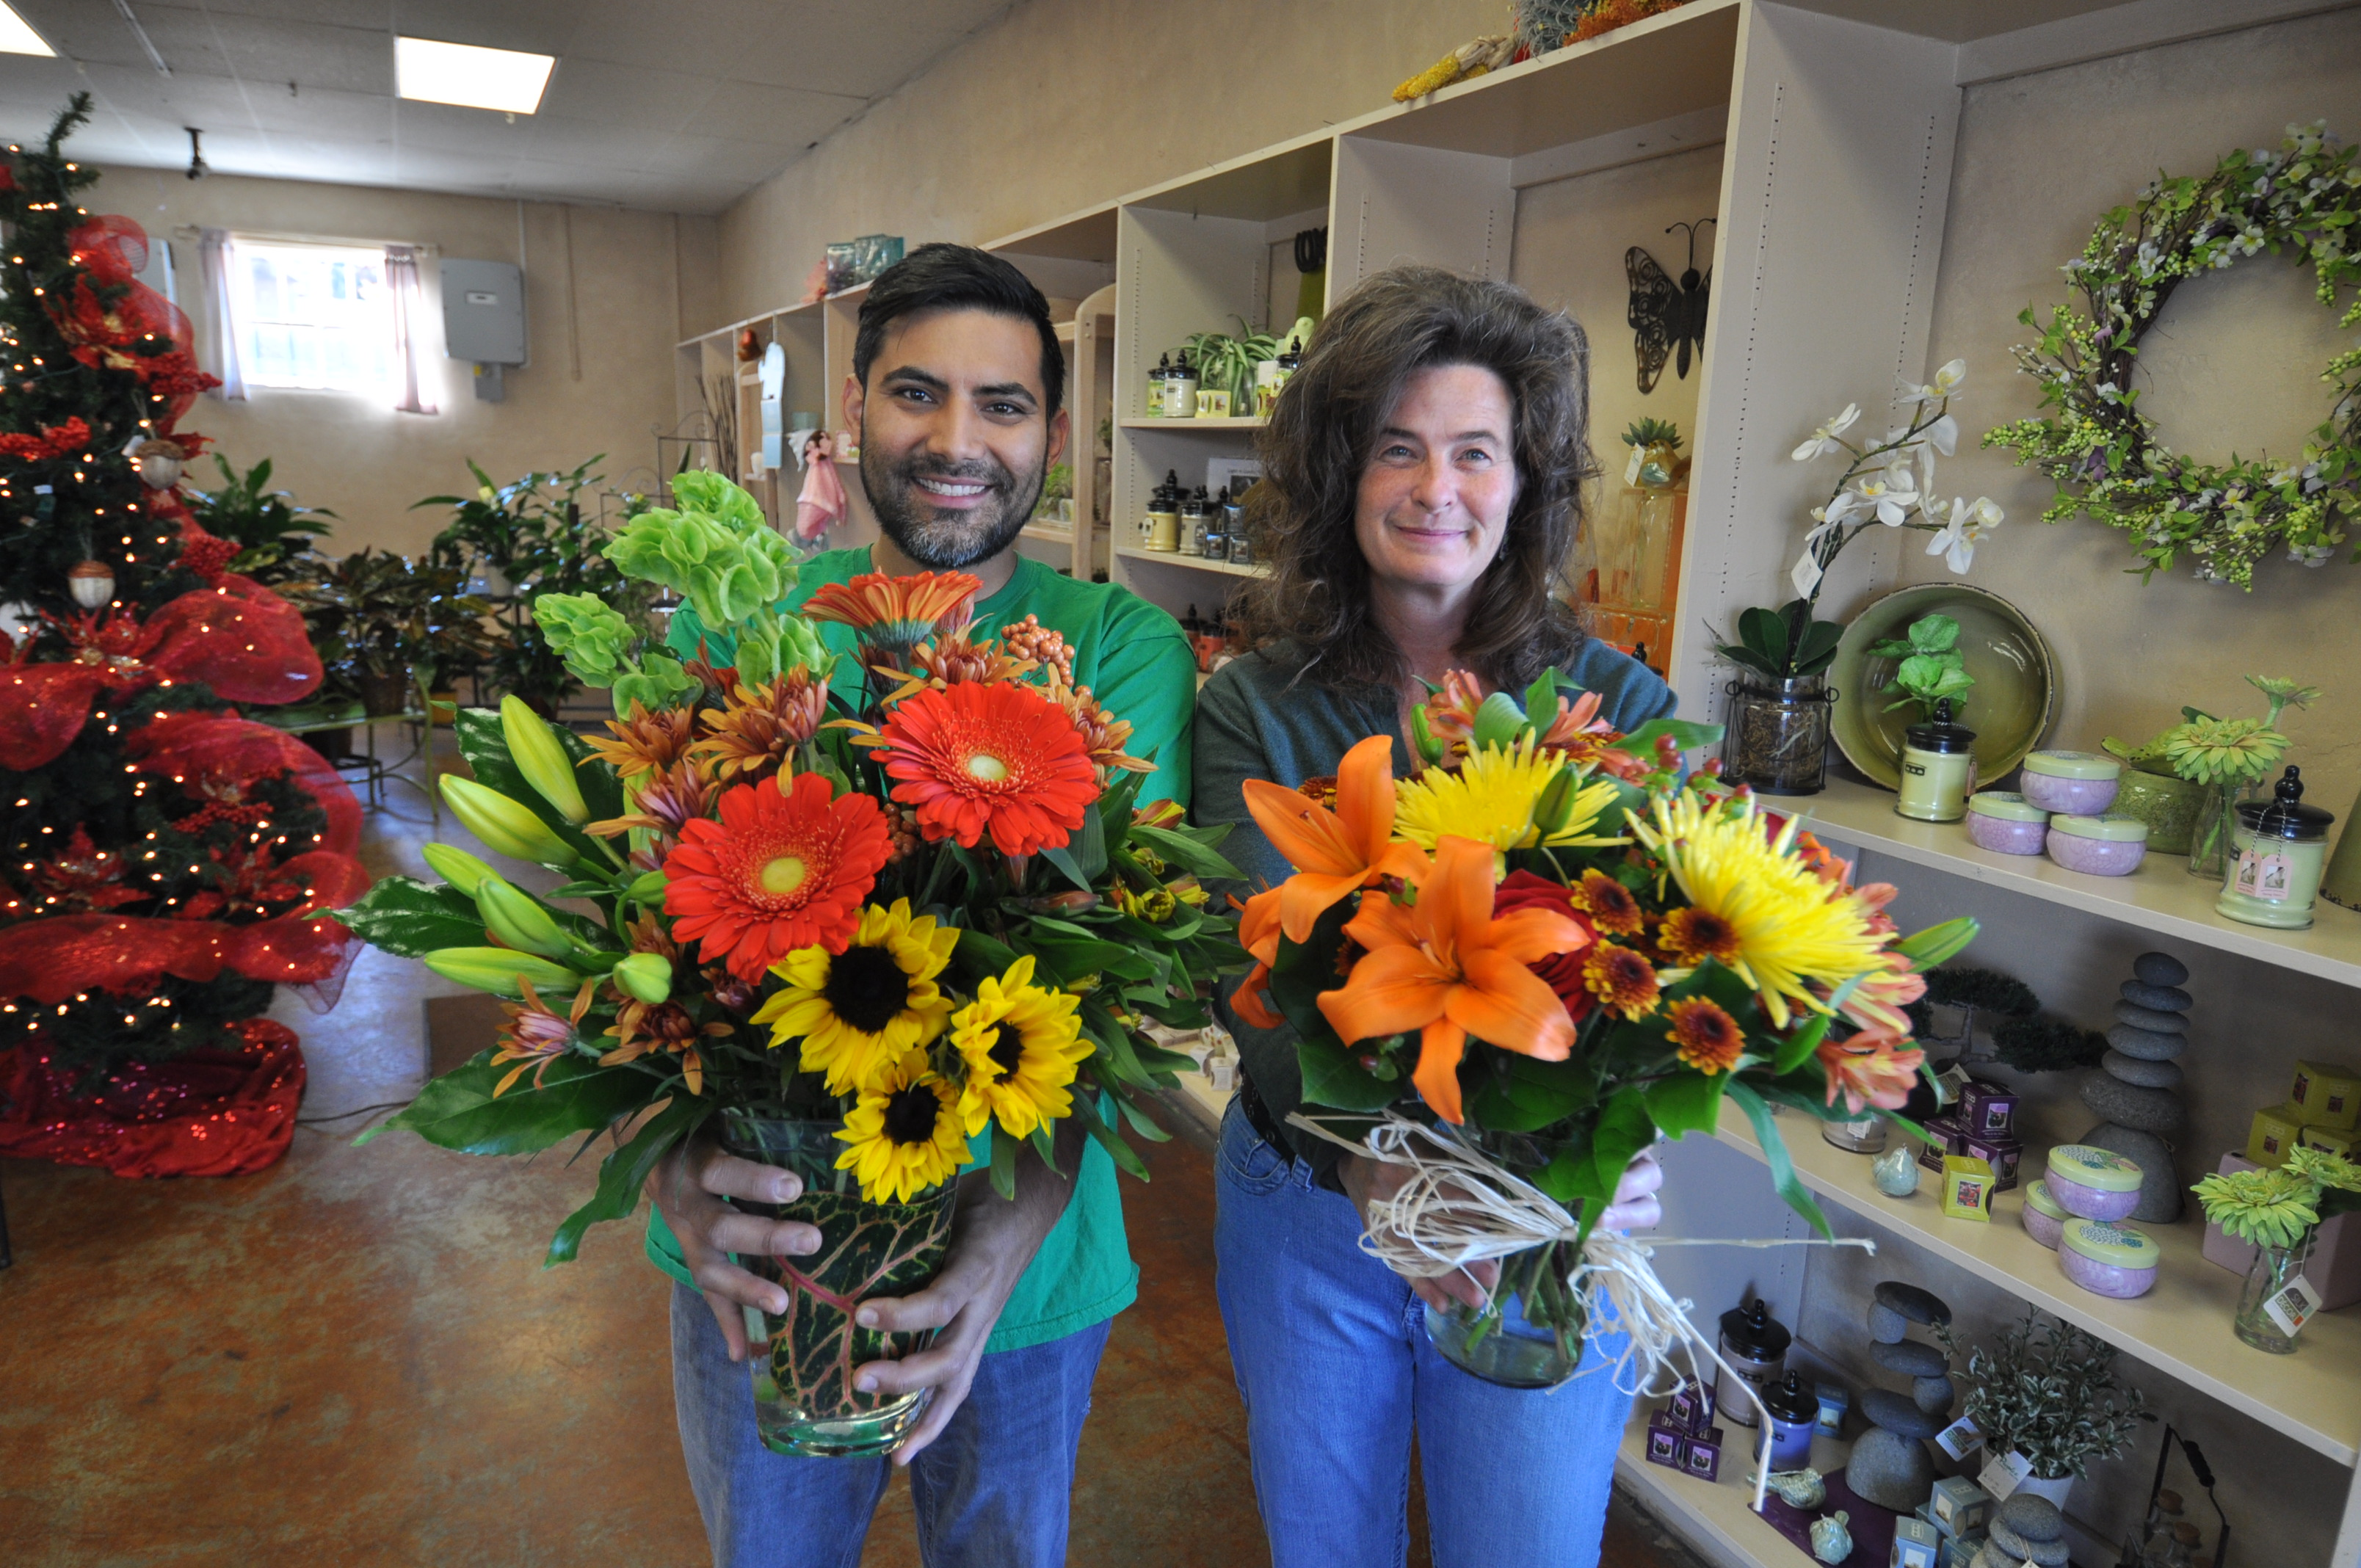 Peoples Flower Shops Nob Hill Location Albuquerque New Mexico LocalData